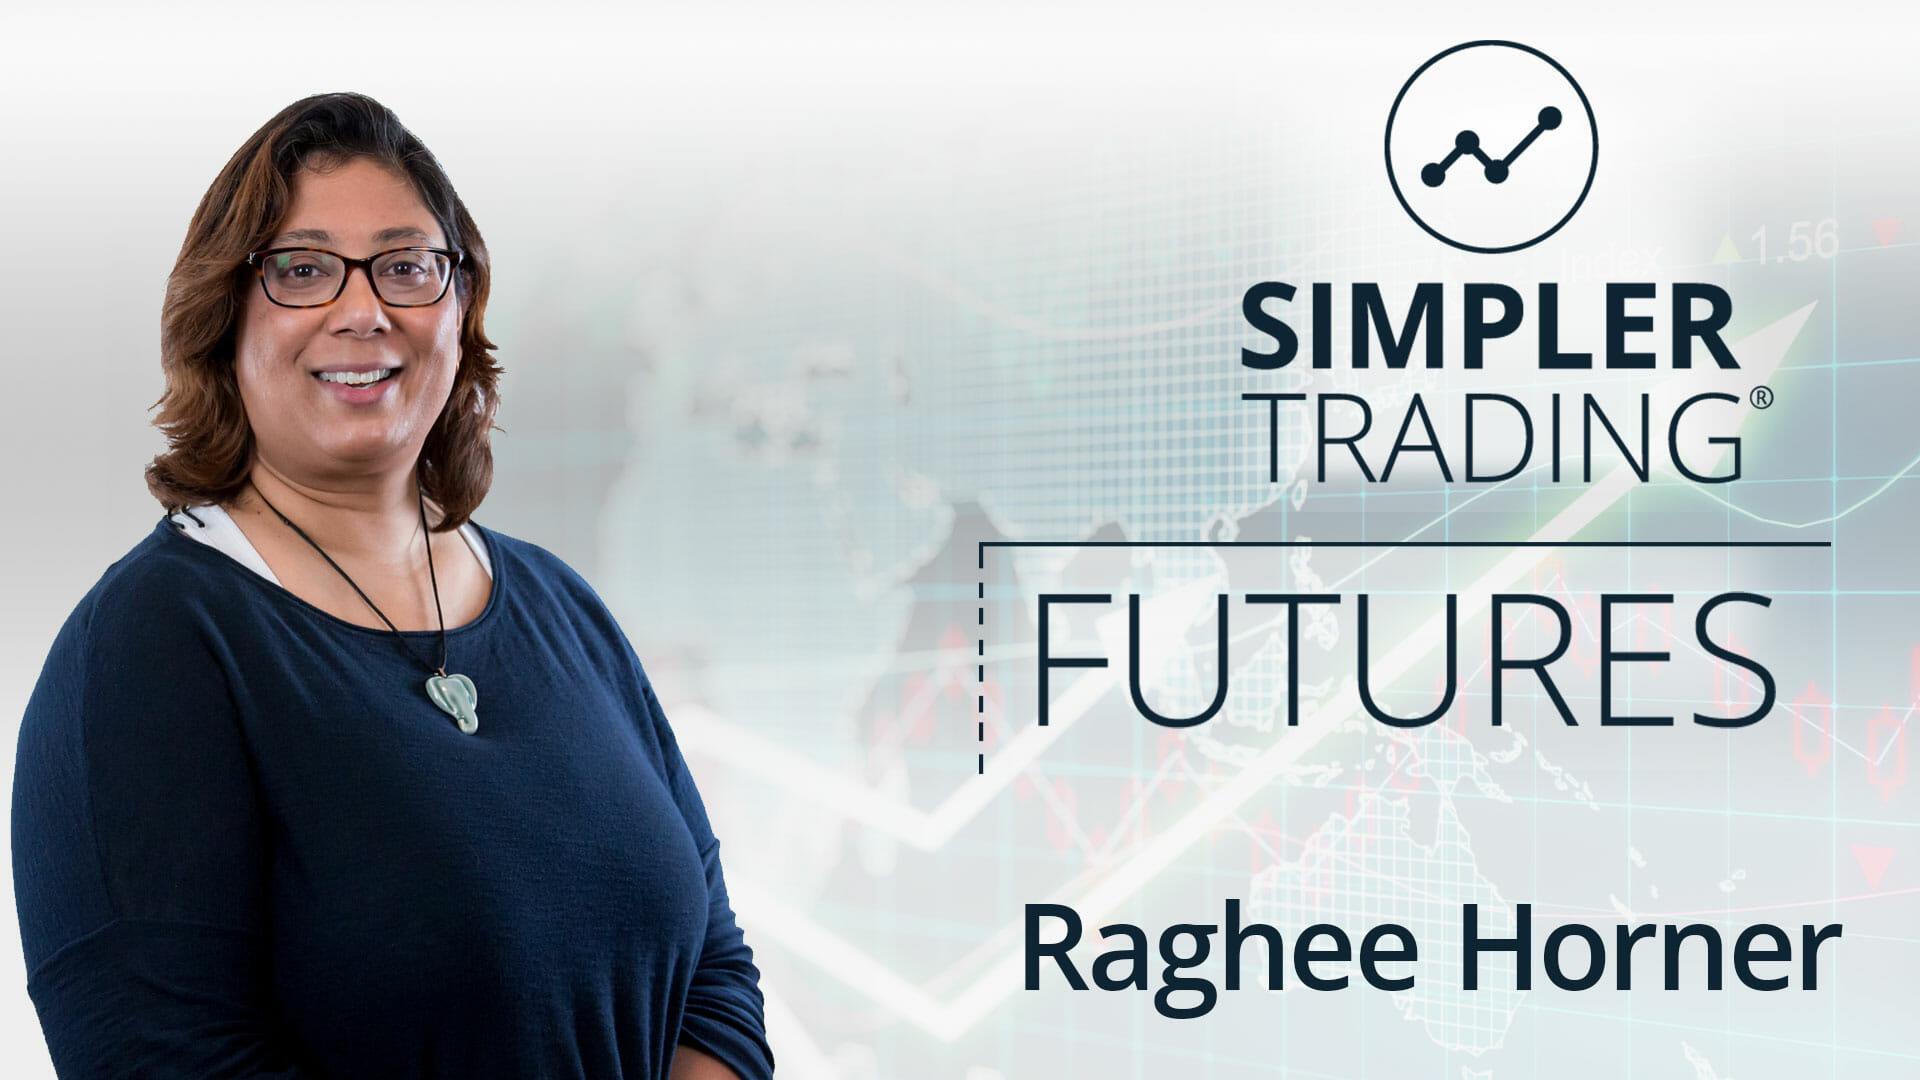 Raghee Horner Futures